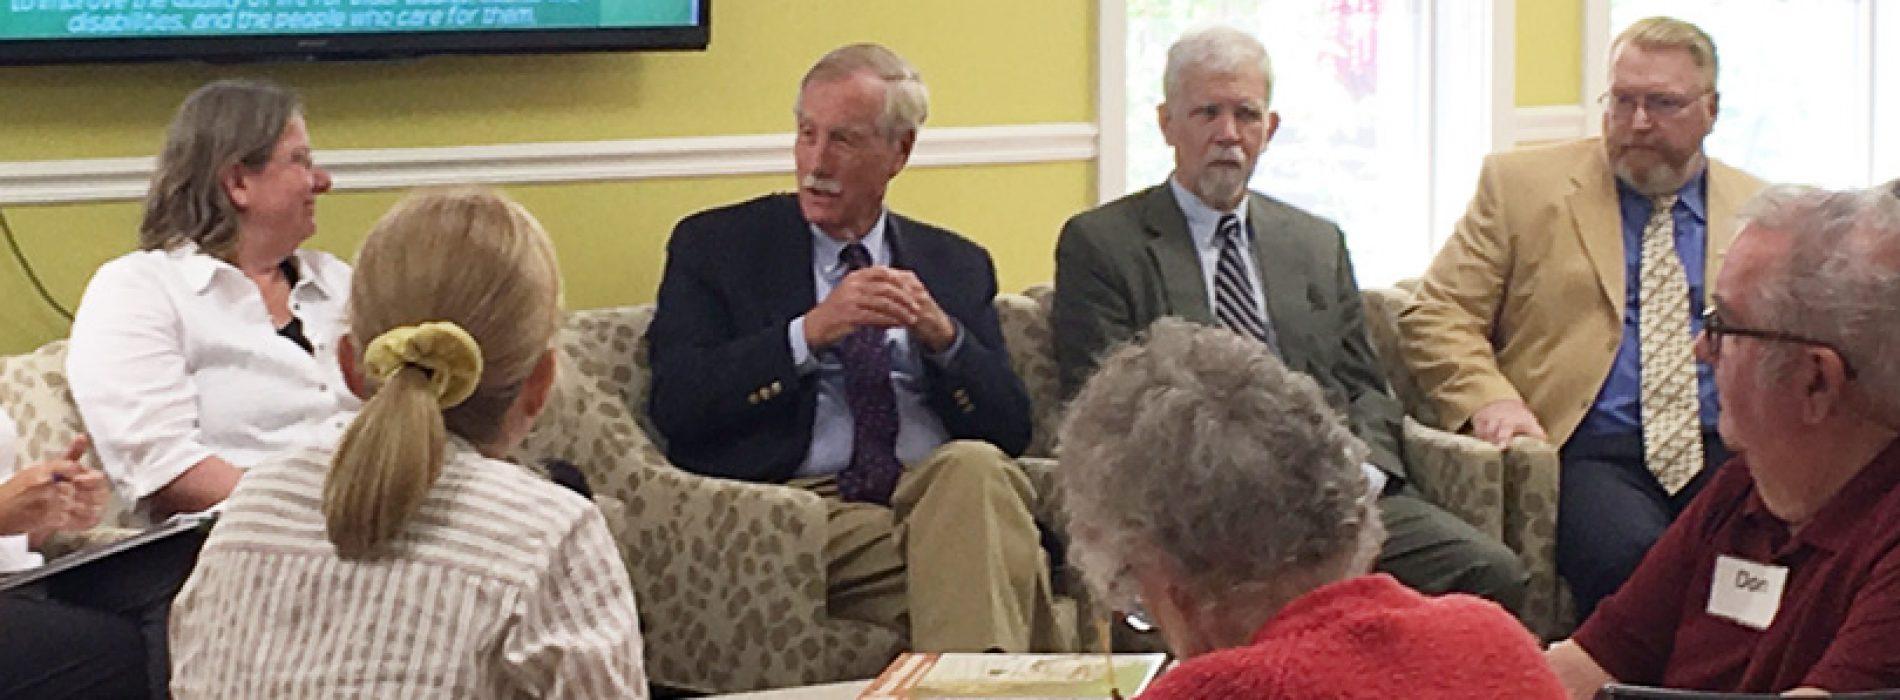 Sen. King backs tax credit for family caregivers